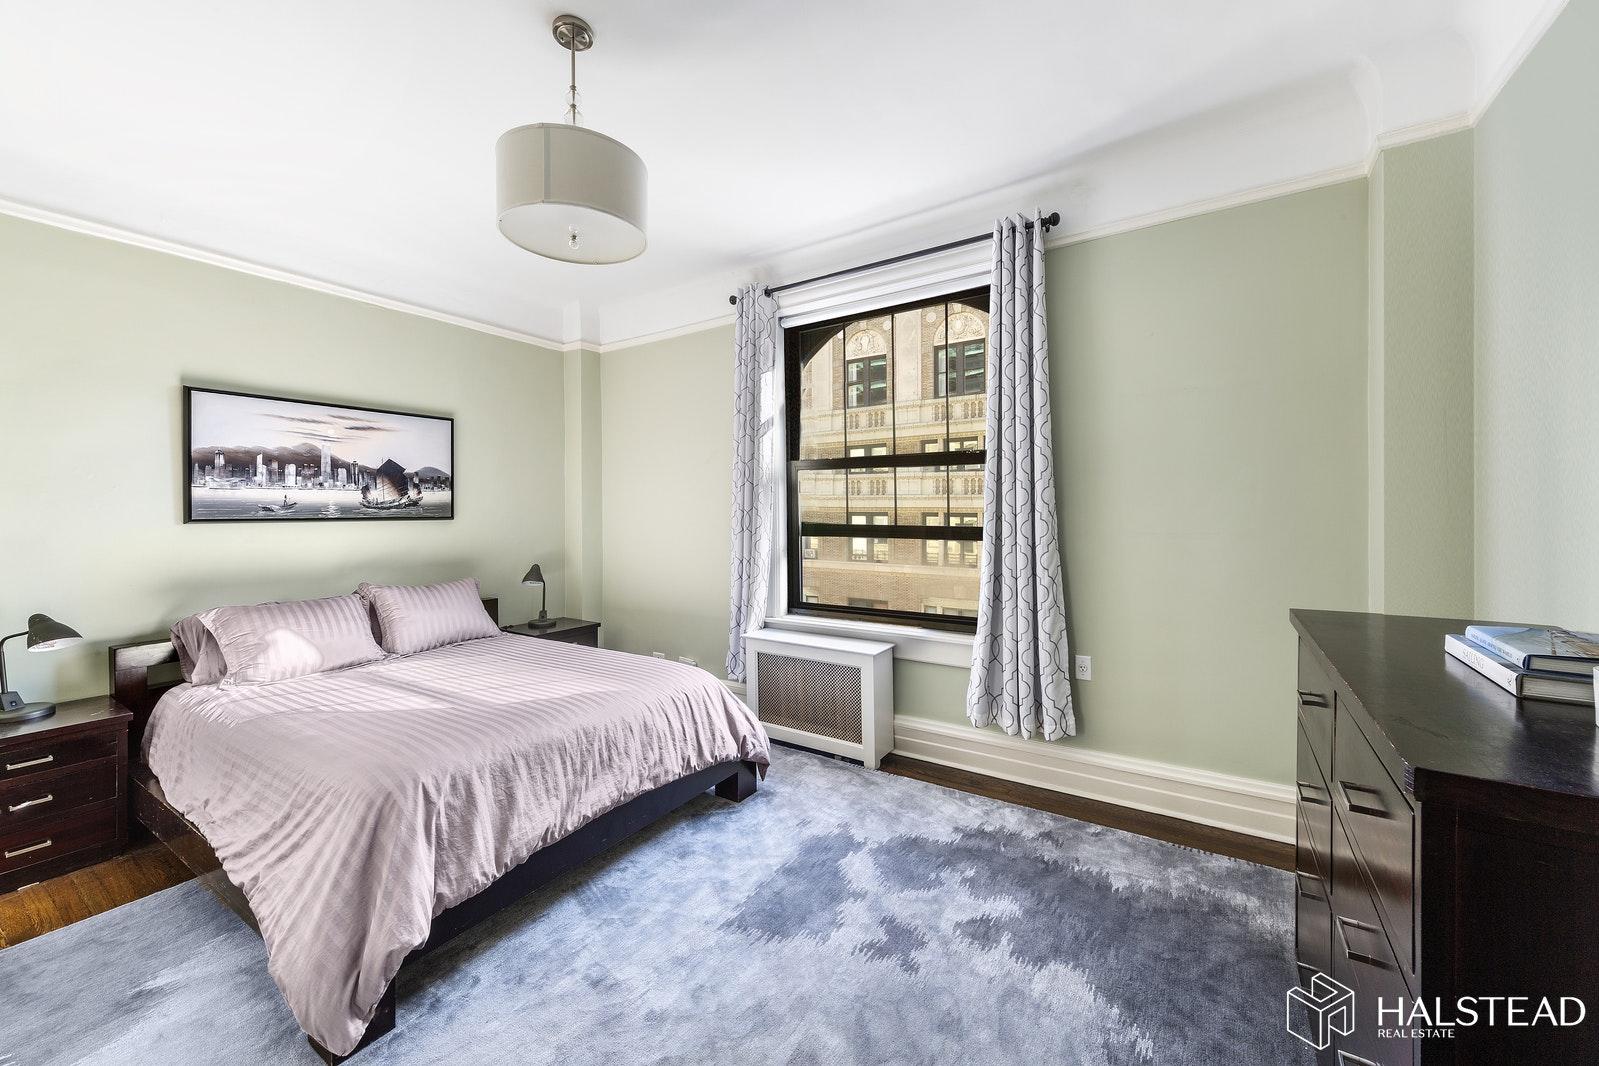 215 WEST 98TH STREET 10B, Upper West Side, $2,695,000, Web #: 19877455